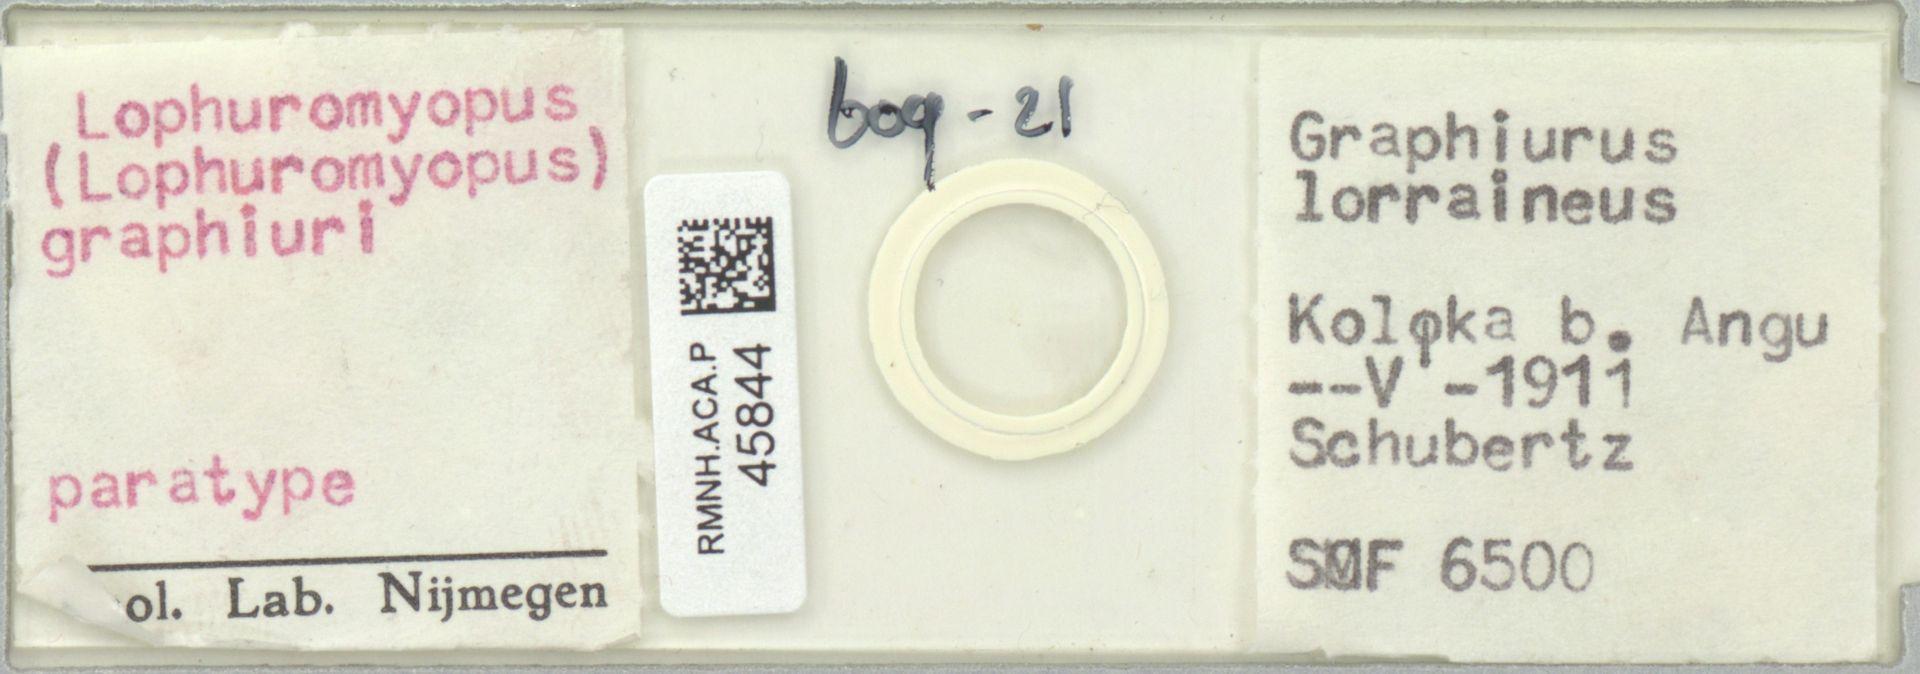 RMNH.ACA.P.45844 | Lophuromyopus (Lophuromyopus) graphiuri